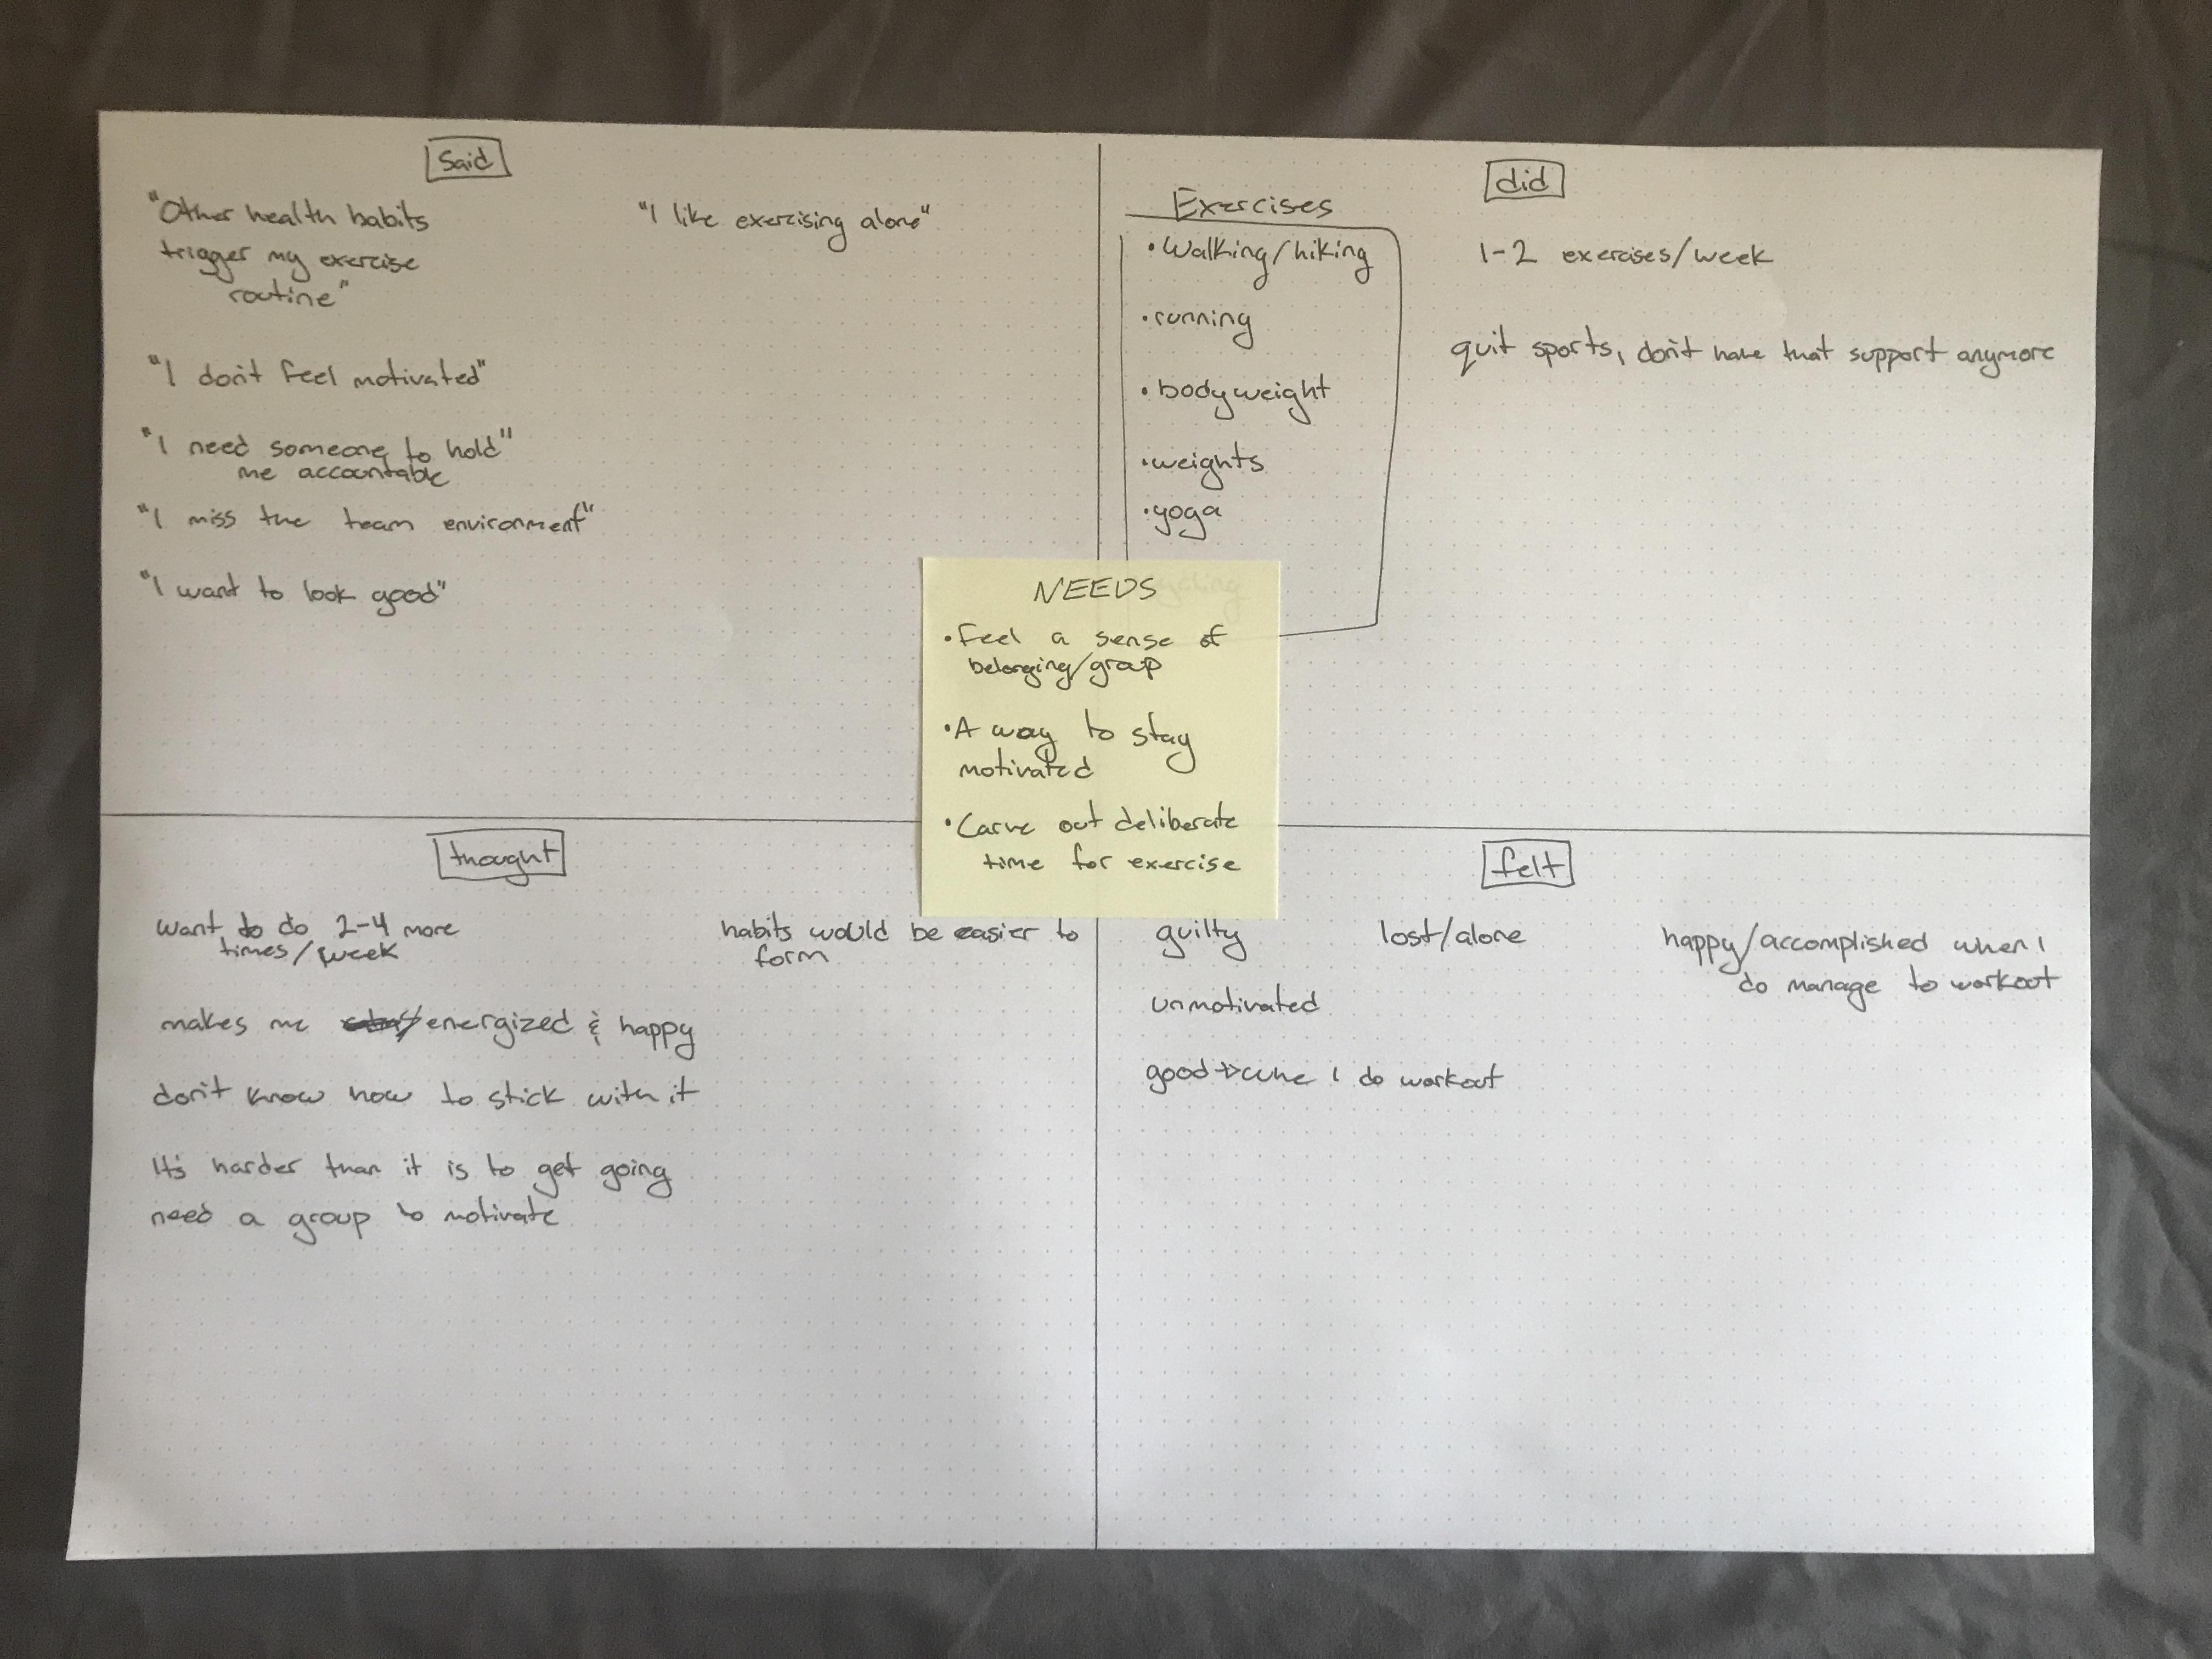 Paper showing user needs